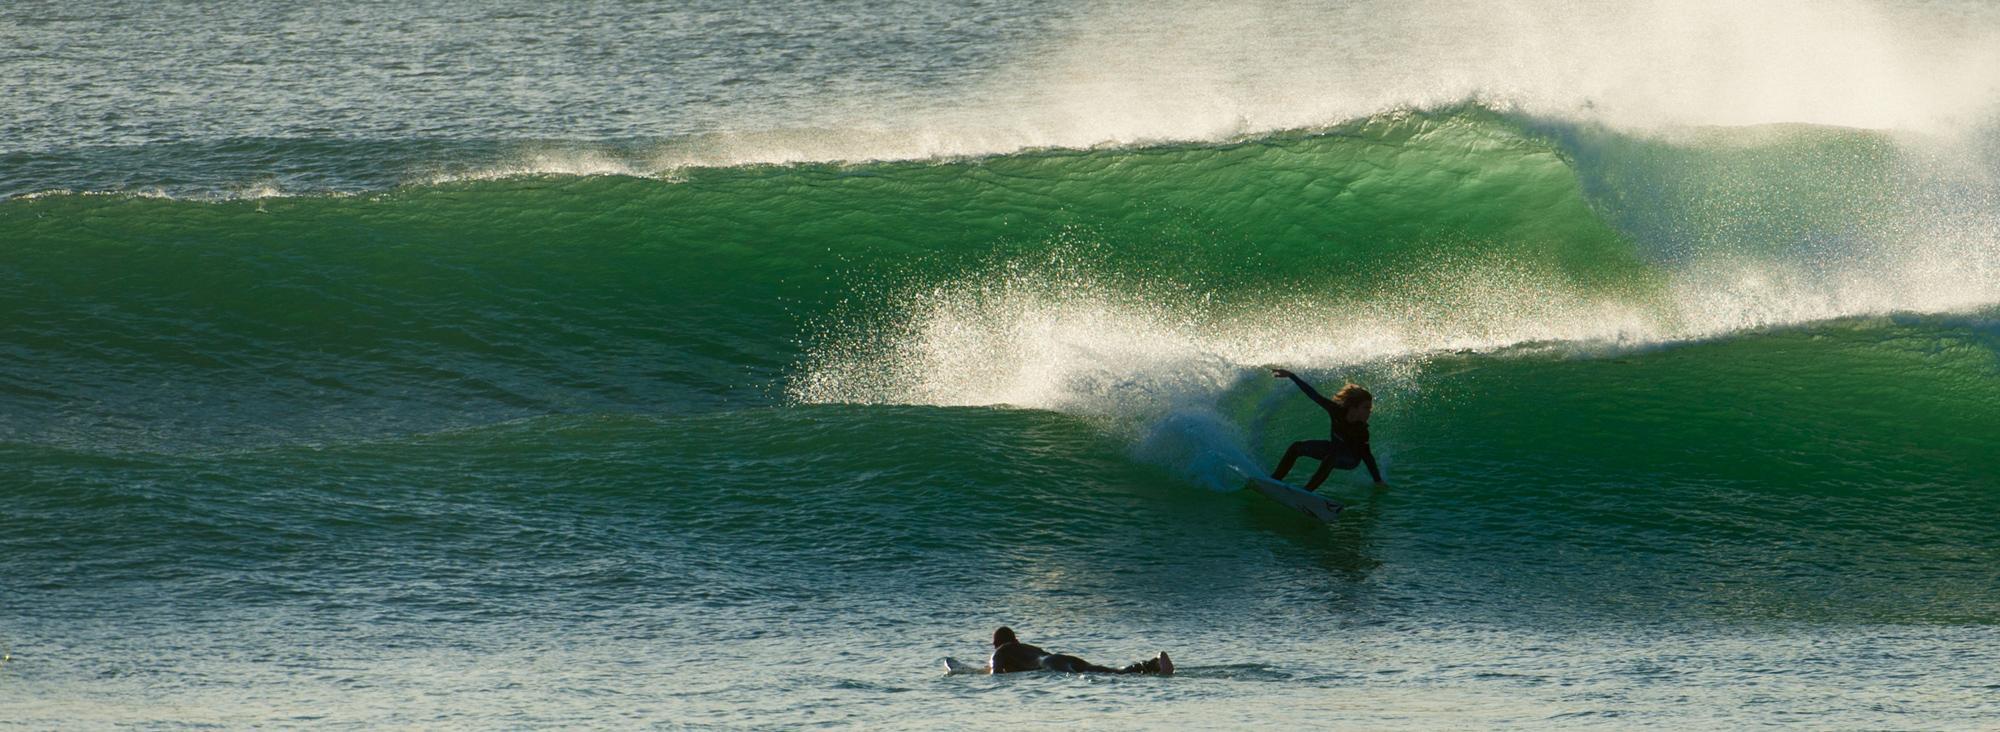 allosurf audience été météo surf kitesurf